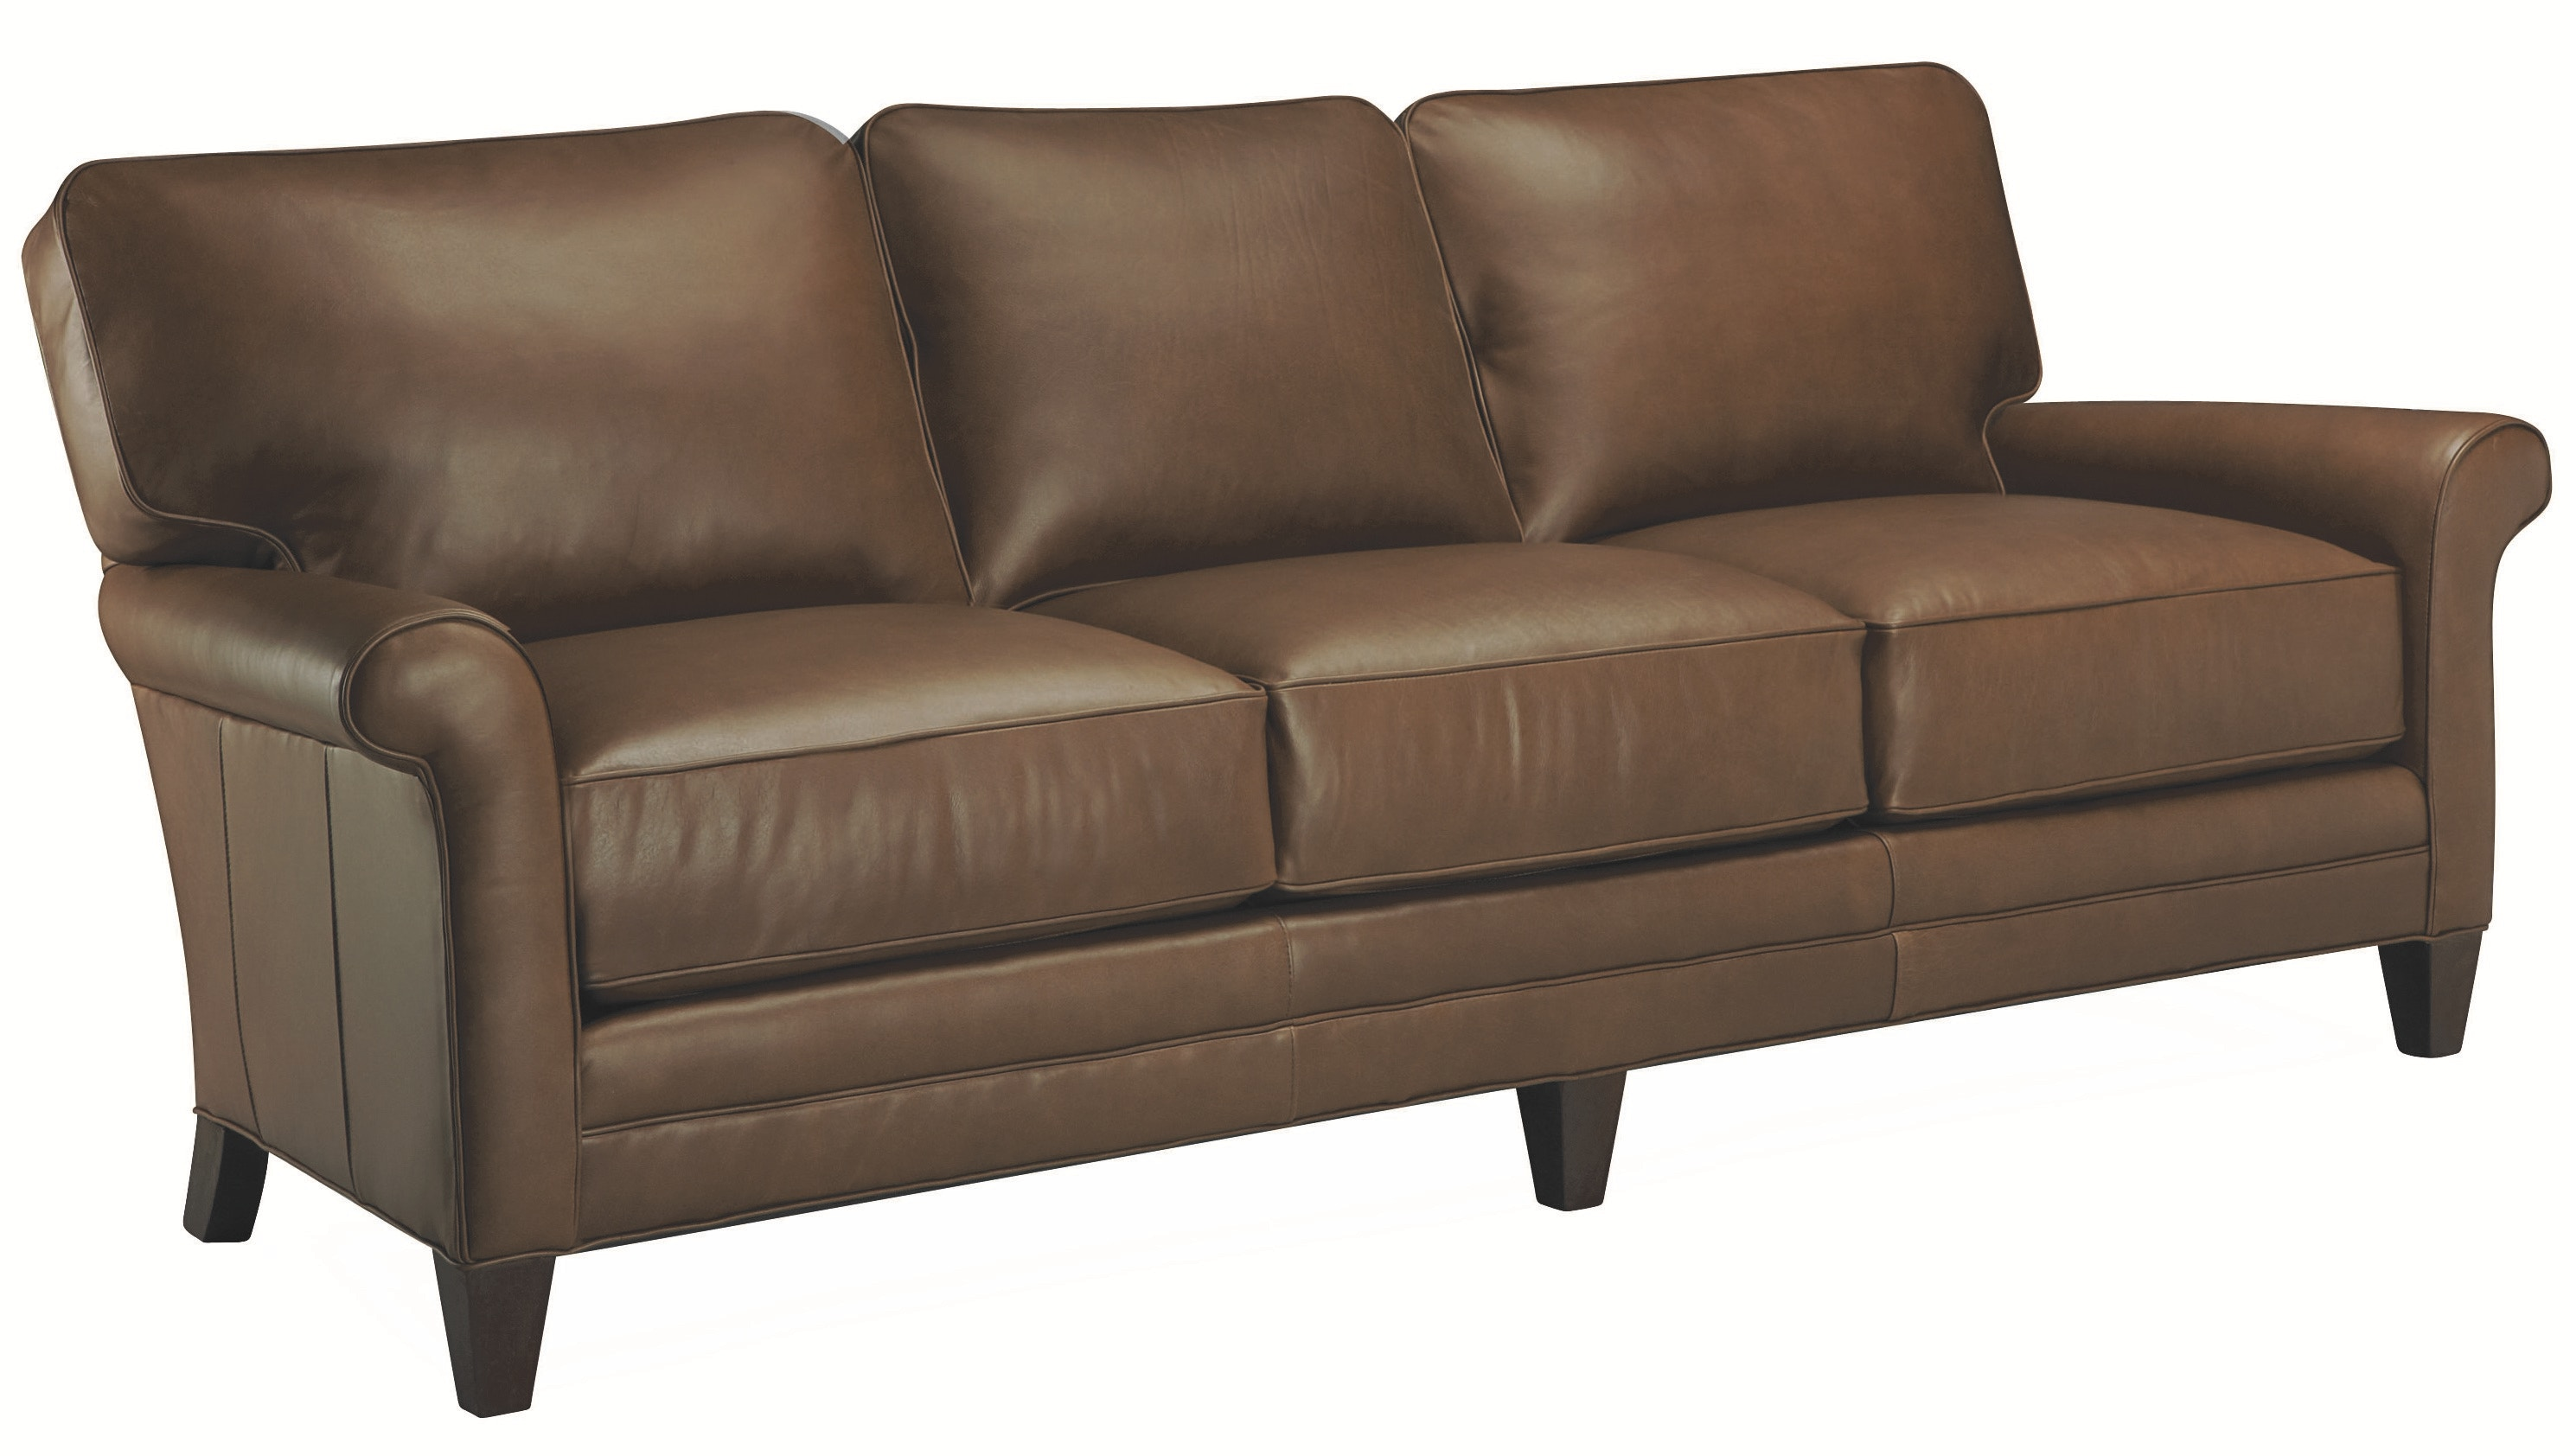 25 beautiful sectional sofas spokane wa rh deronfolou blogspot com